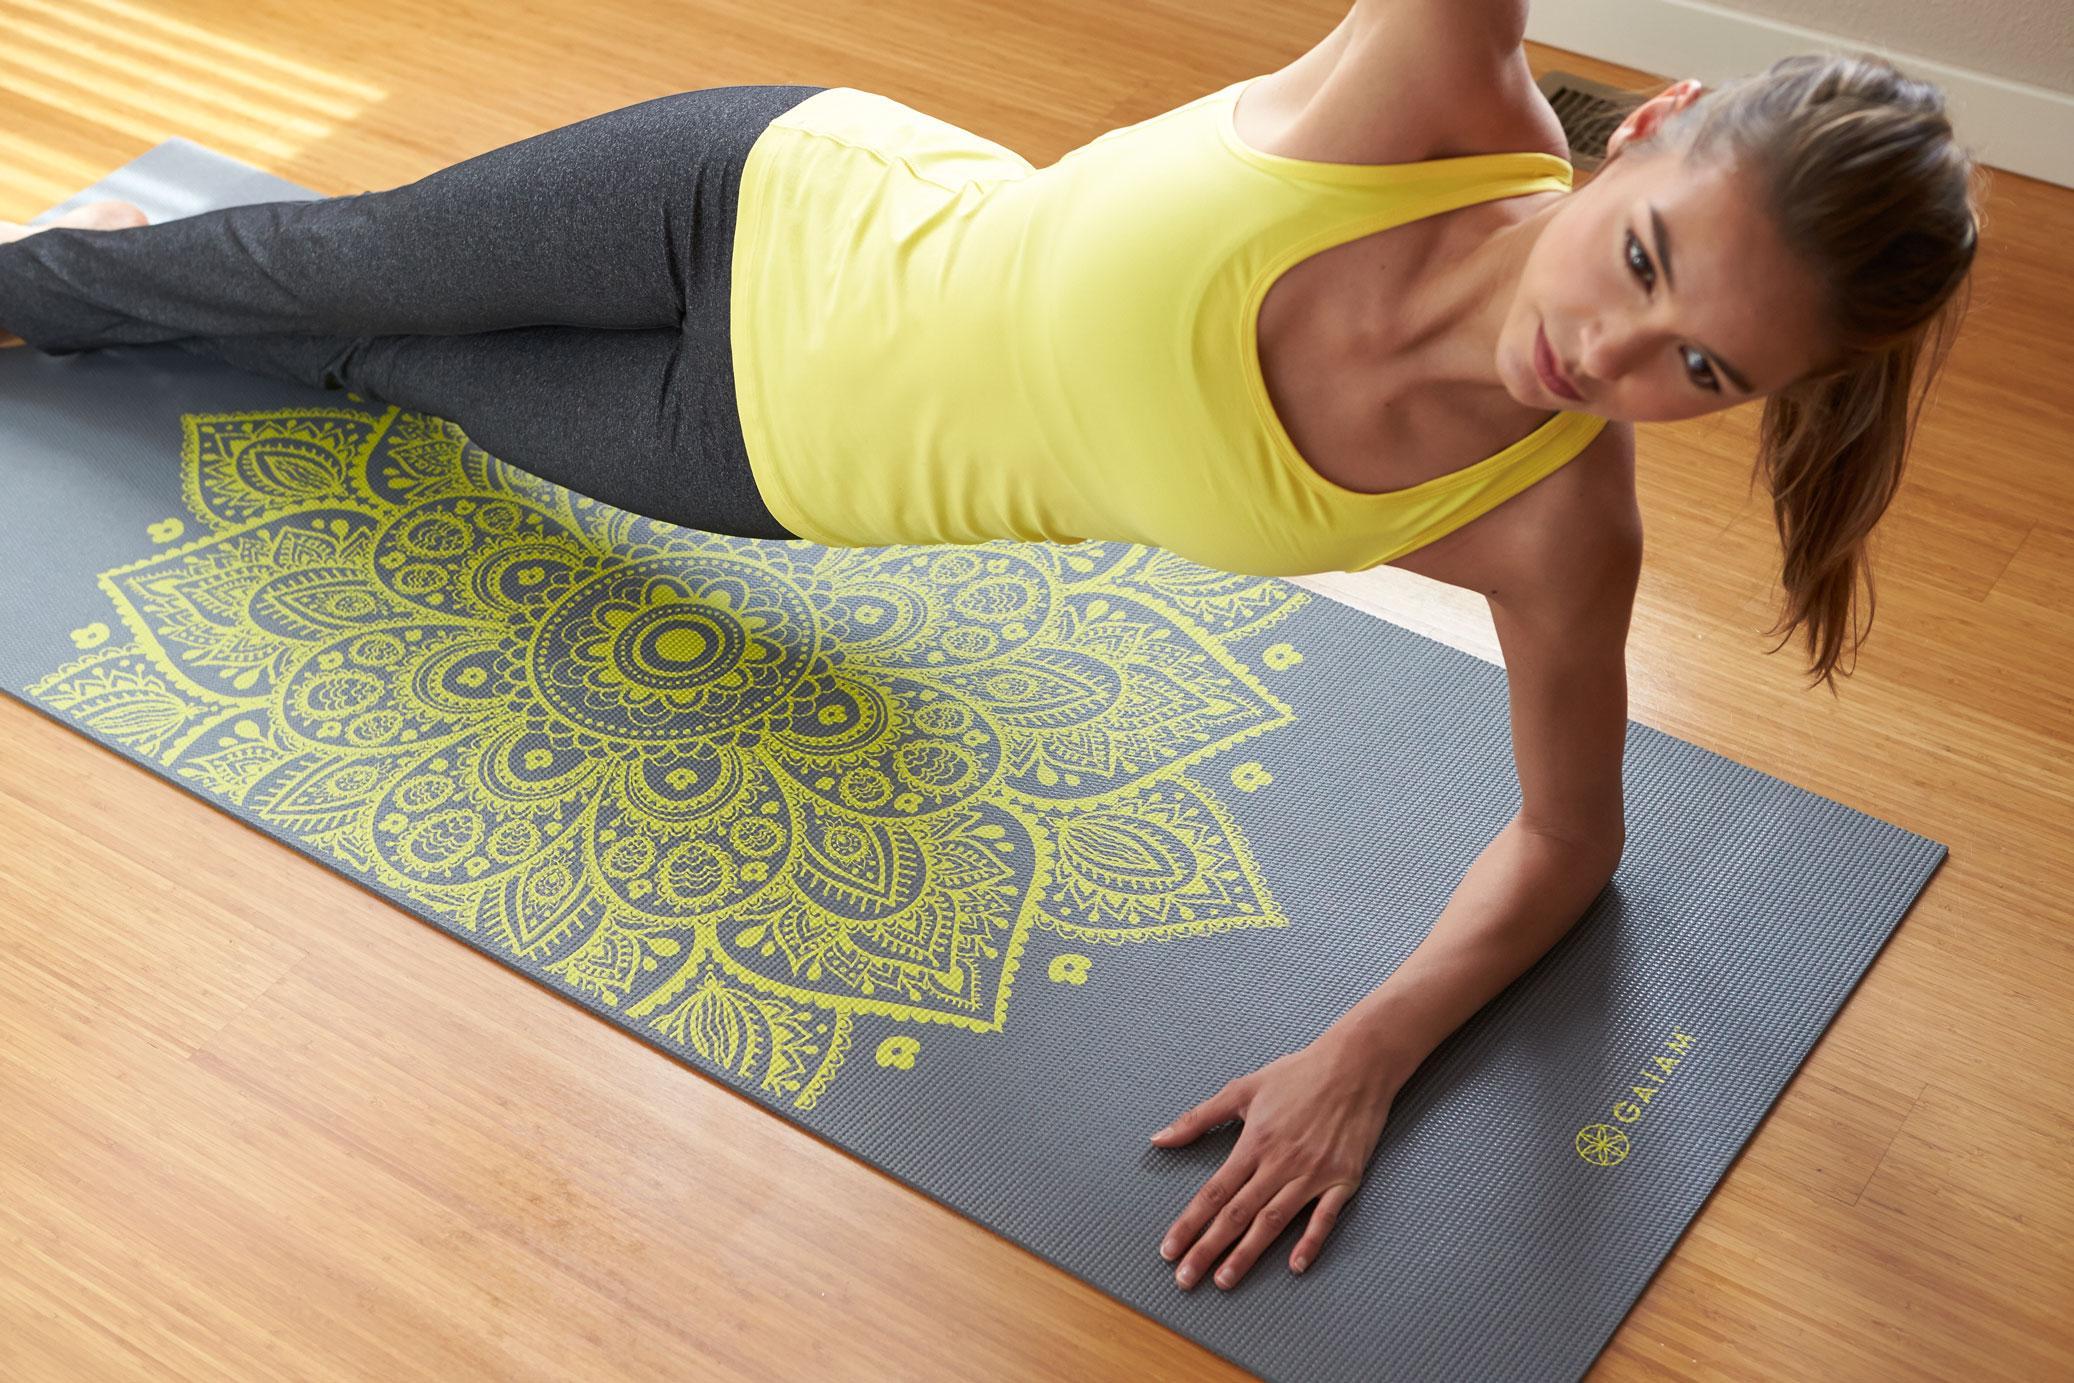 Gaiam Print Premium Yoga Mat Workout Fitness Exercise